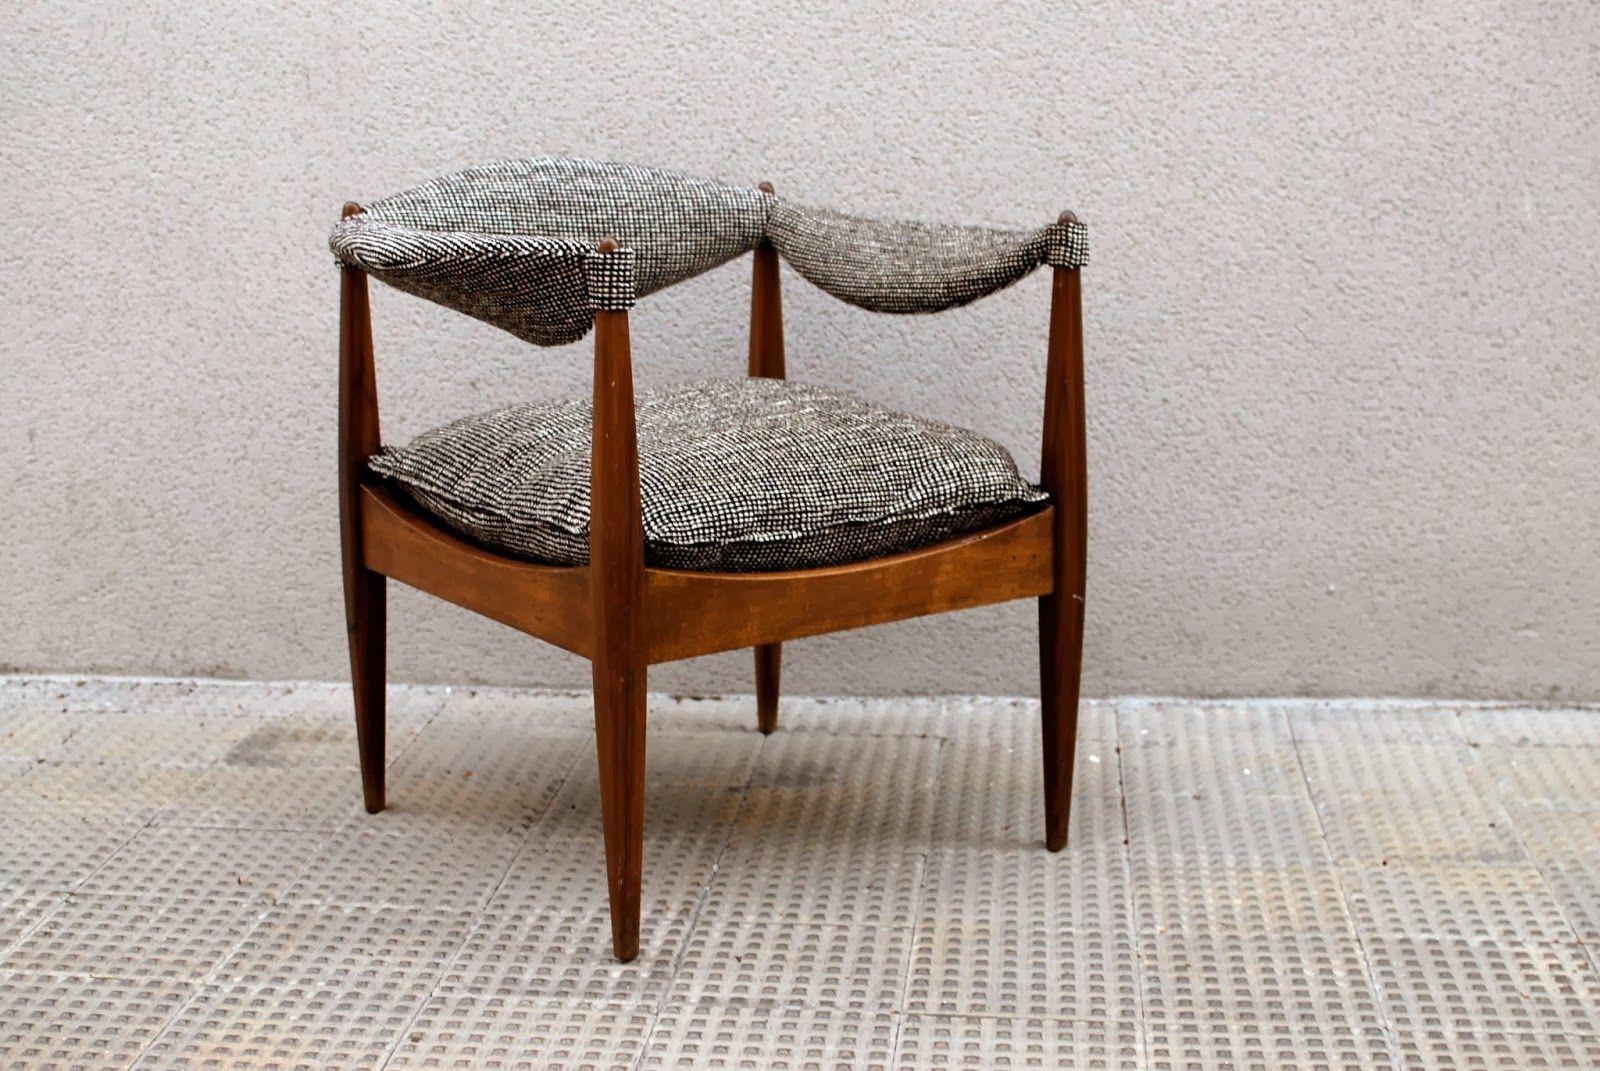 Mobiliario siglo xx y l mparas fase interior designers - Sillas anos 60 ...